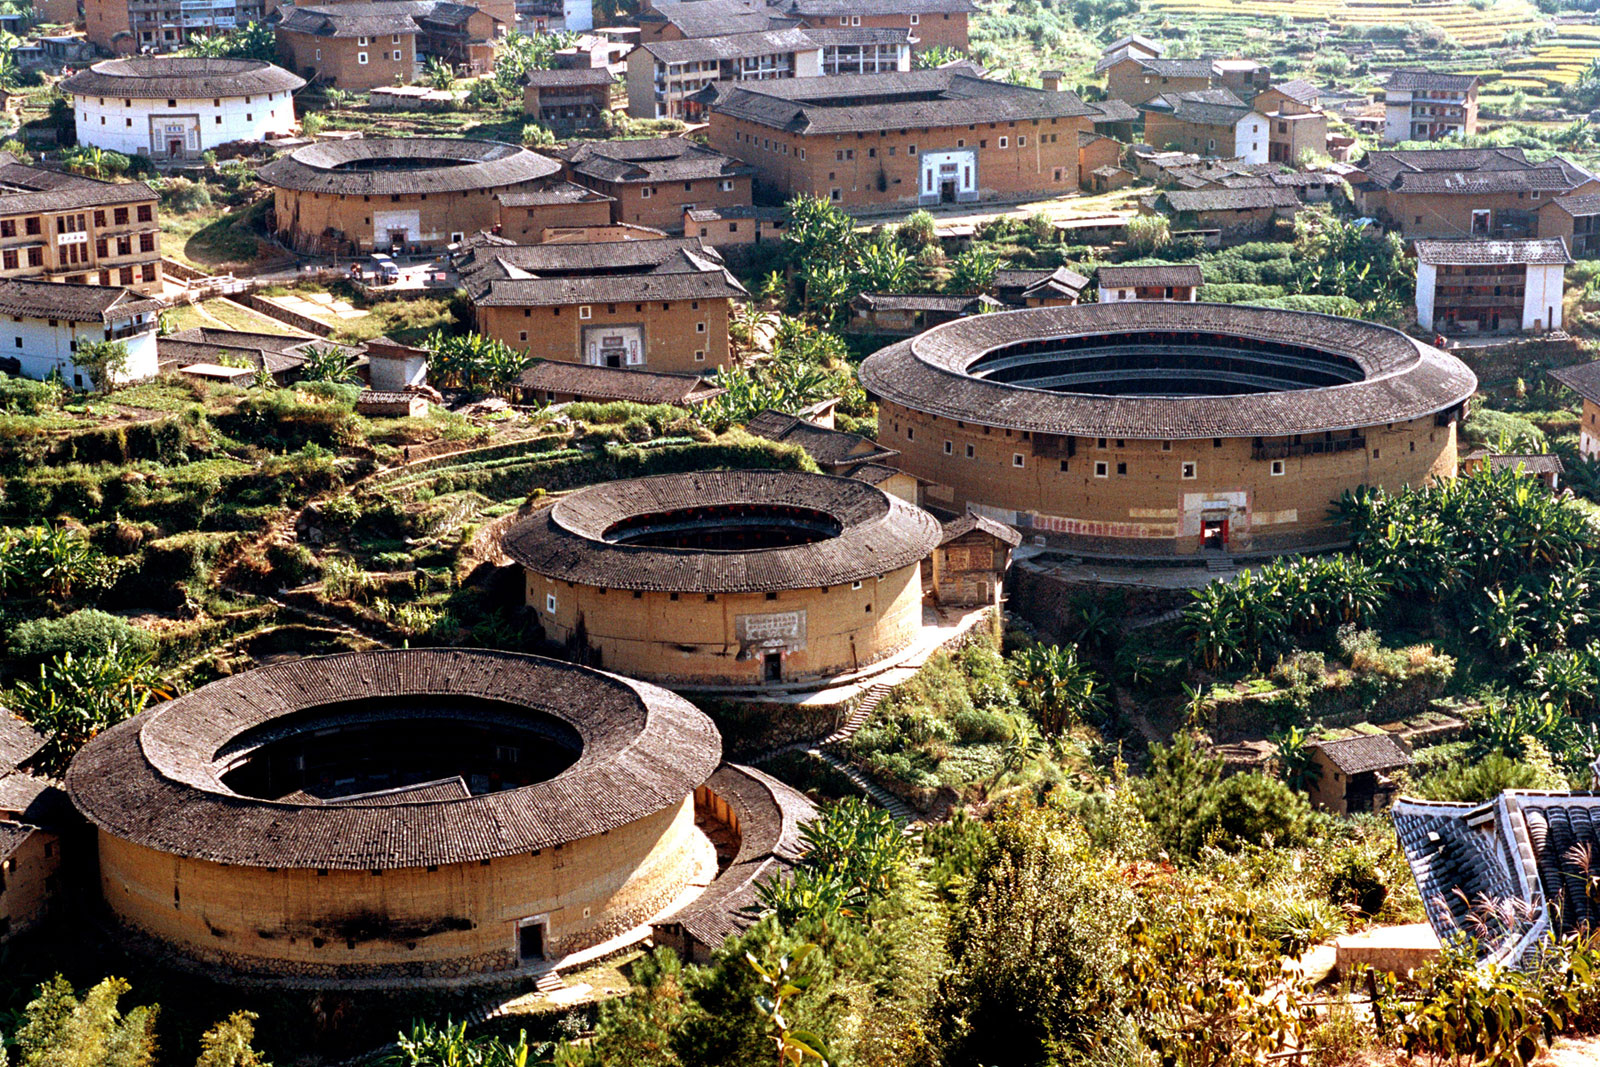 Tulous, Hakka Round Earth Buildings